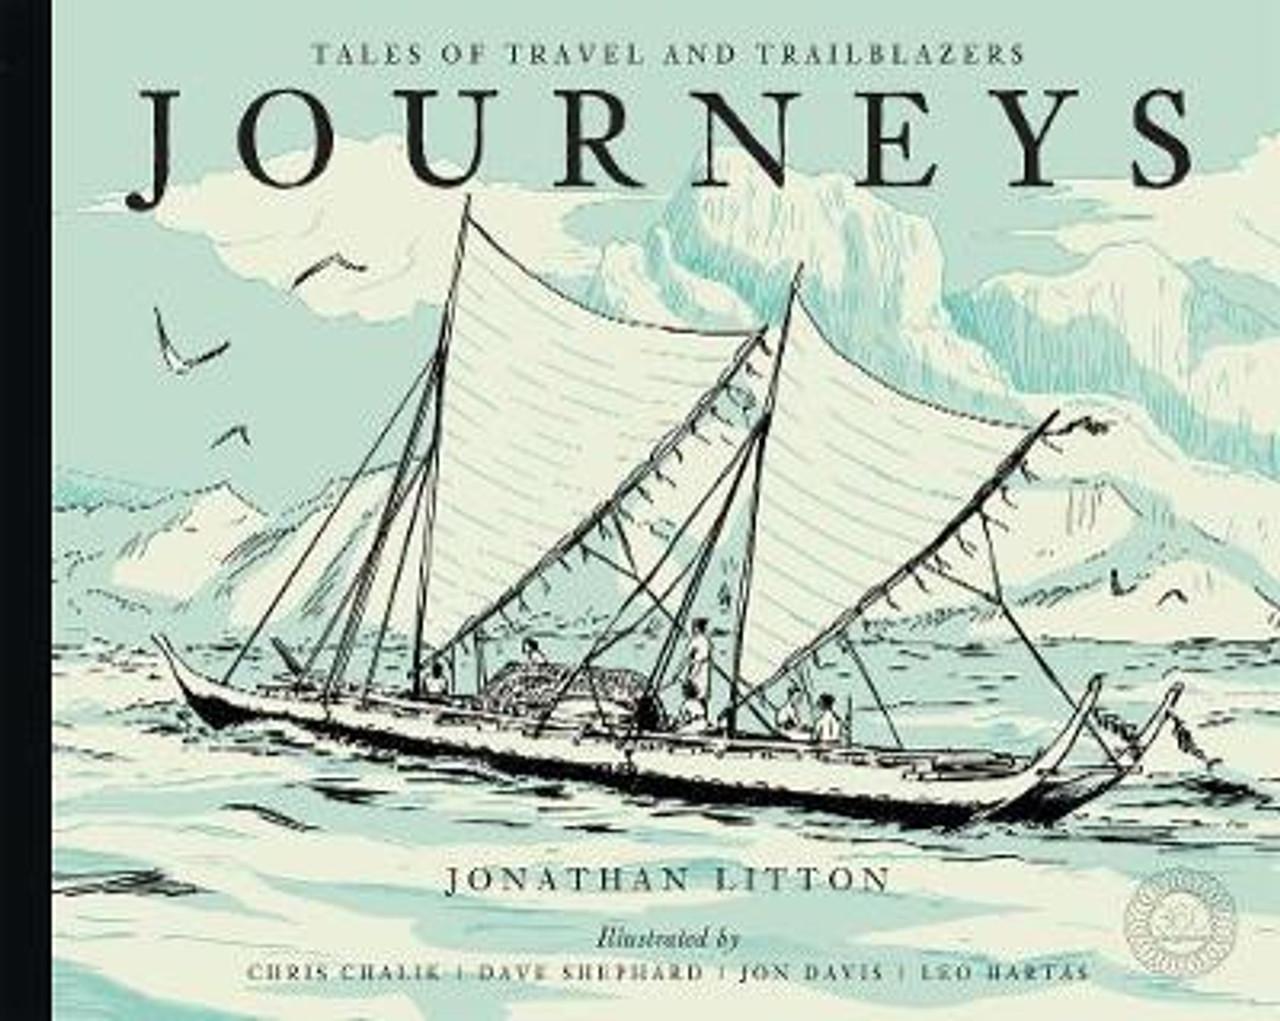 Litton, Jonathan - Journeys : Tales of Travel & Trailblazers - Childrens Explorers Illustrated HB 2018